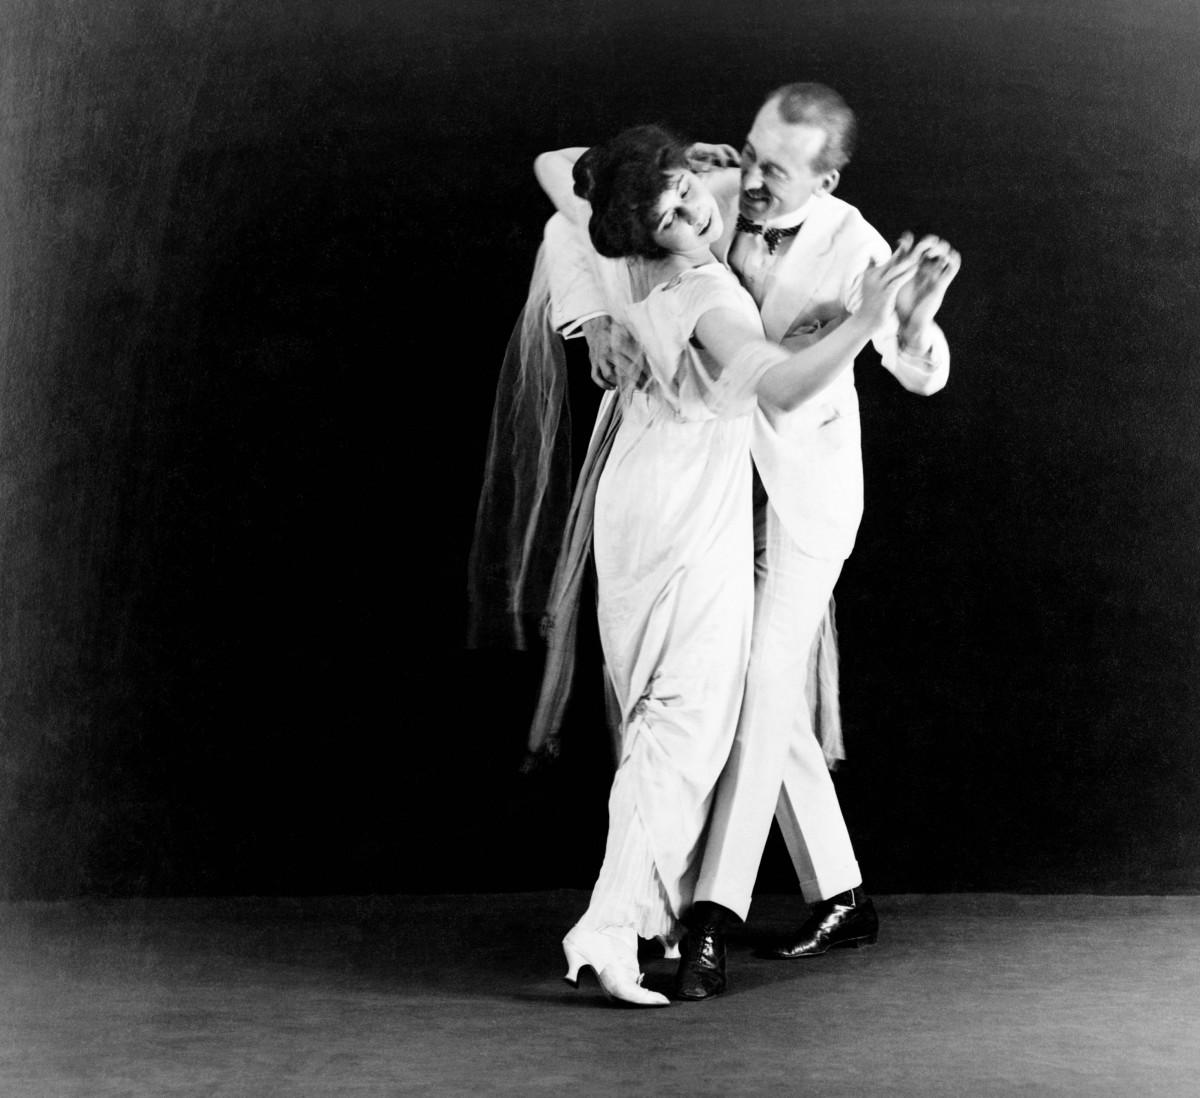 The Closeness of Ballroom Dancing